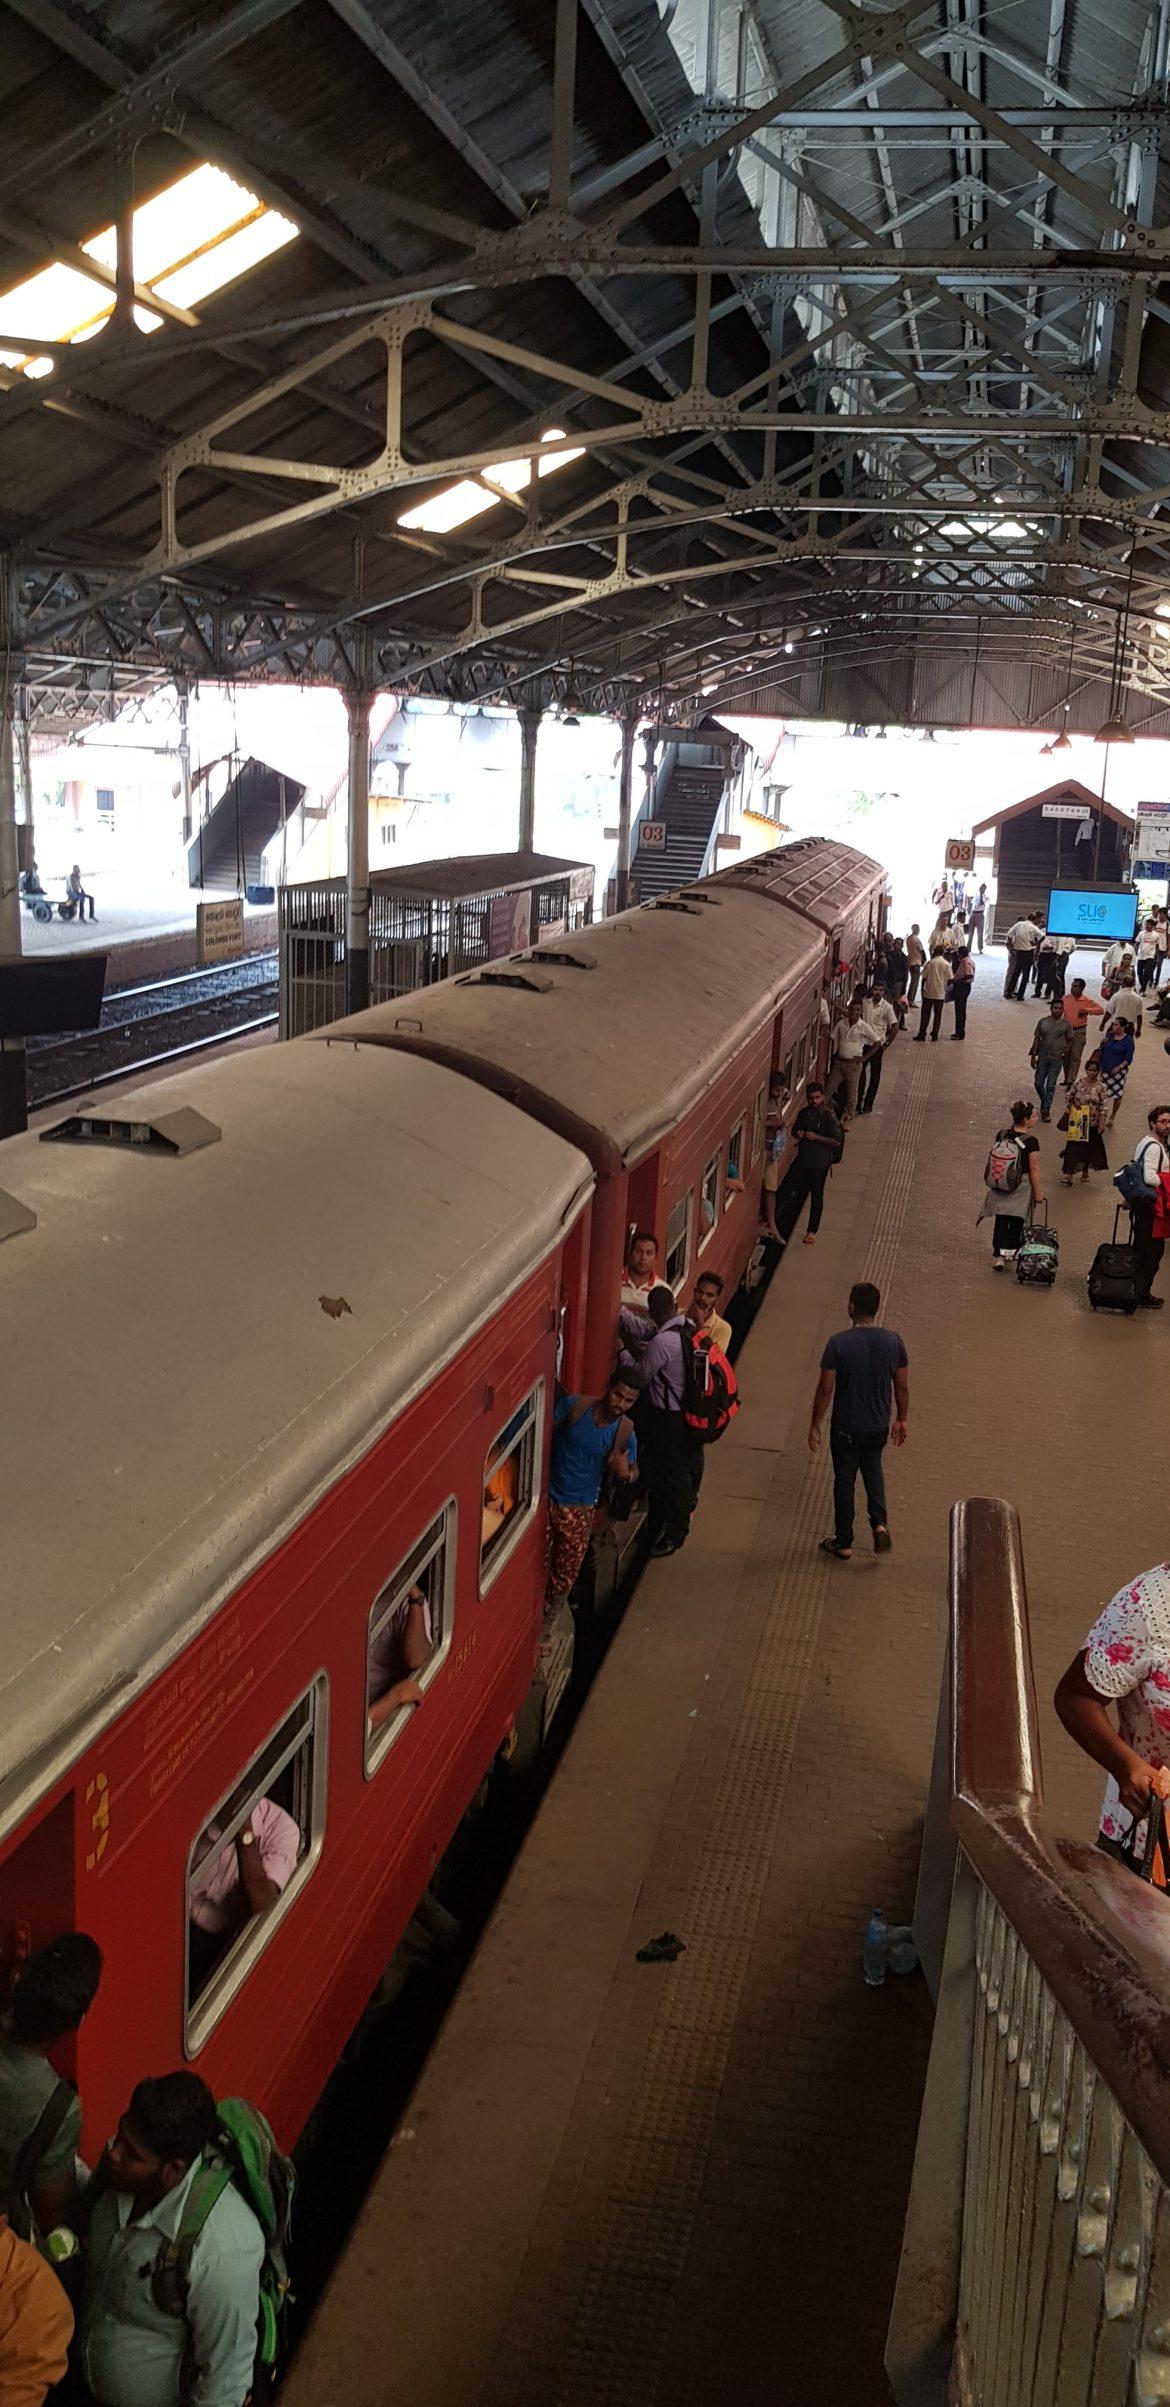 Sri lanka juna unawatunaan